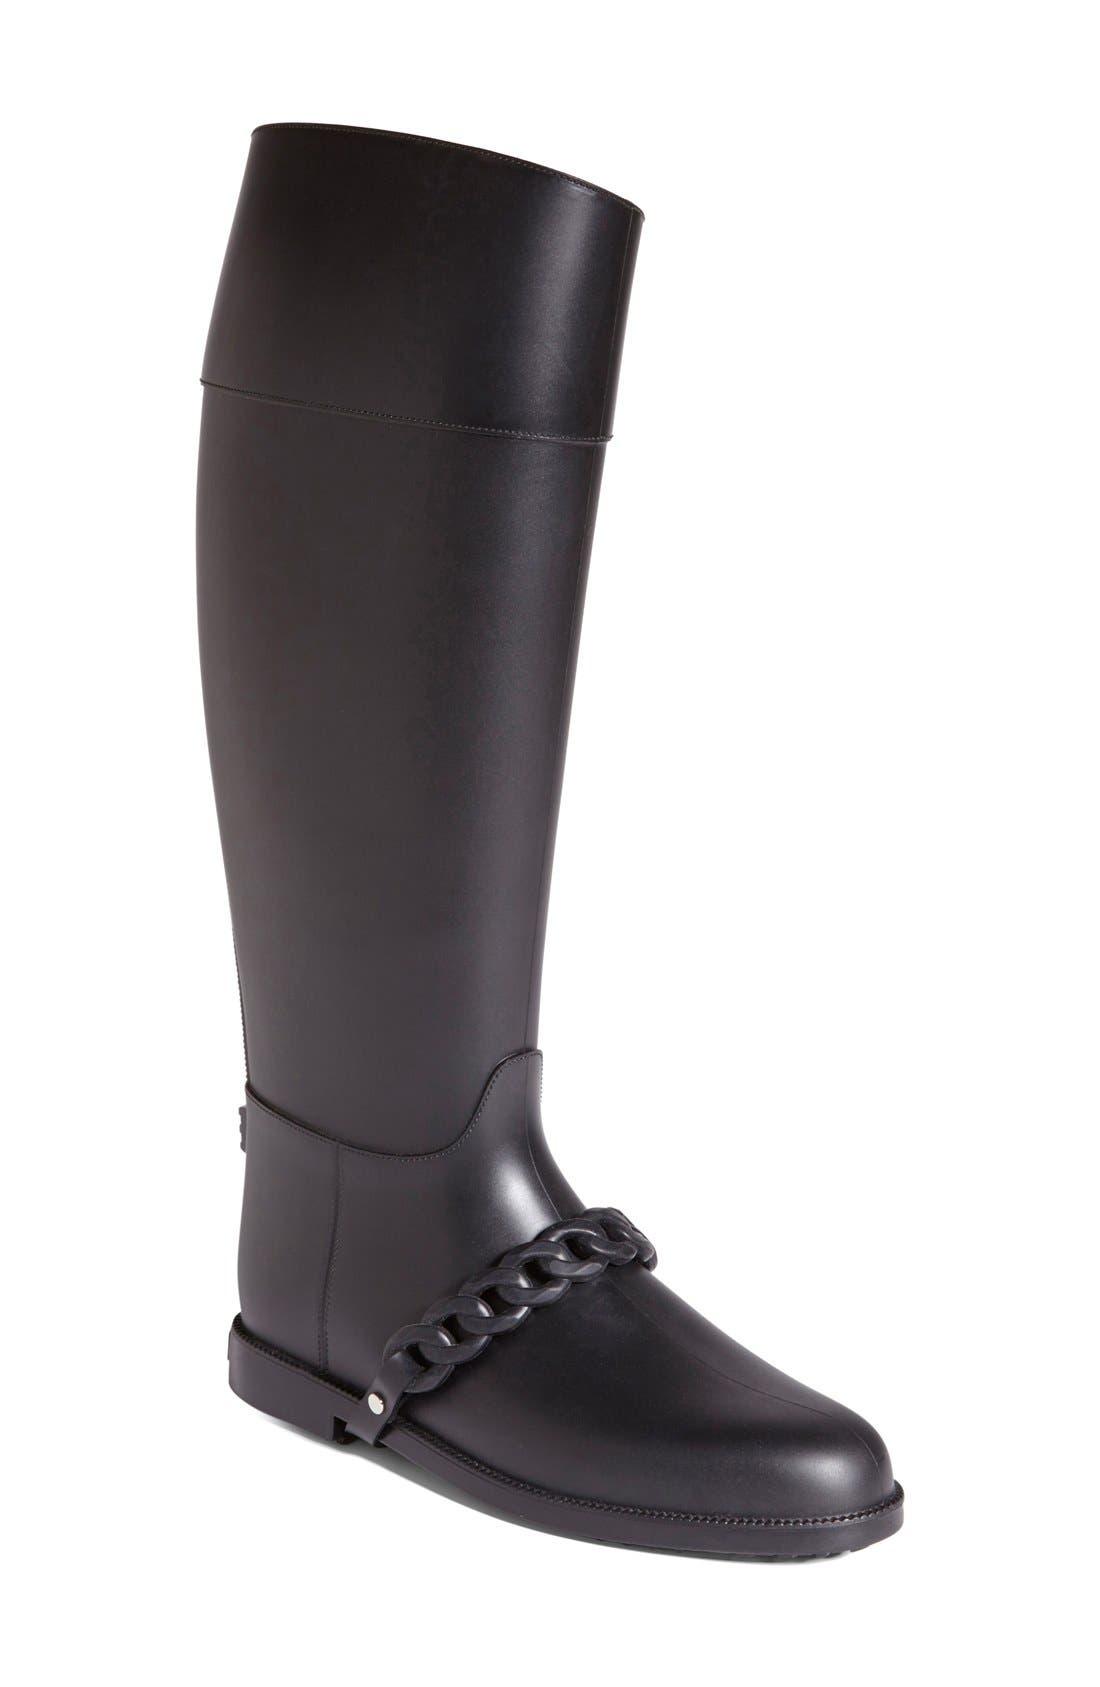 Main Image - Givenchy 'Eva Chain' Tall Rain Boot(Women)